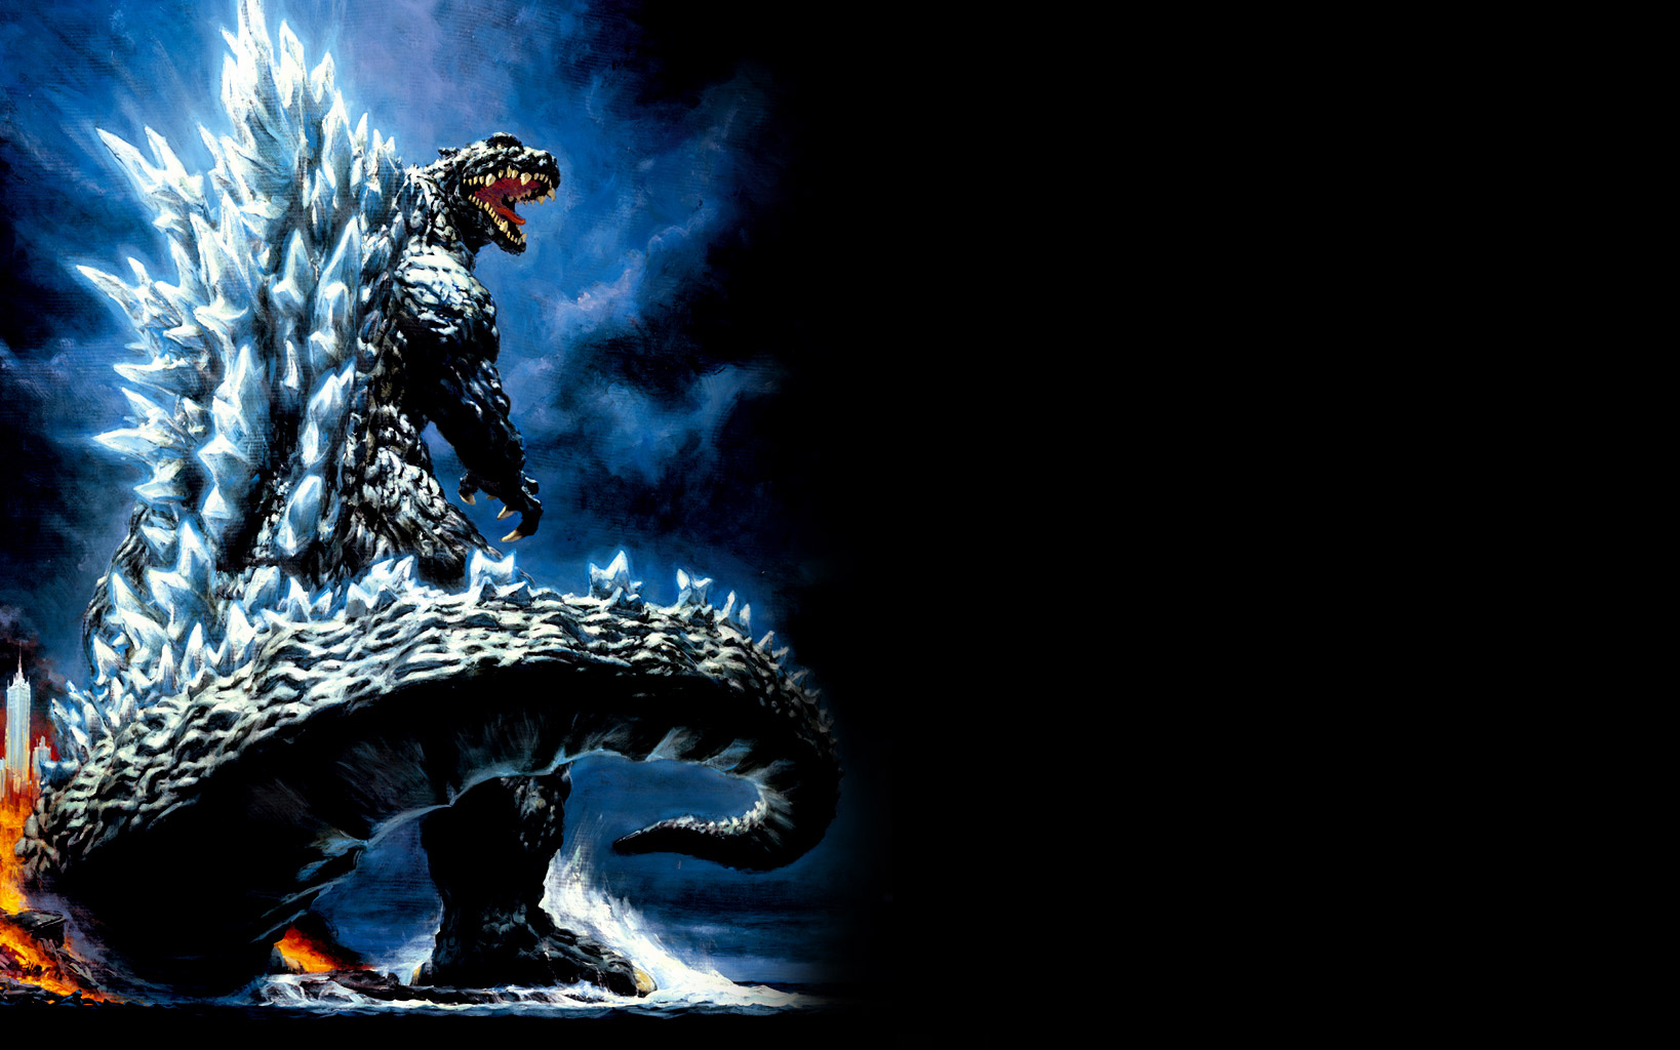 Godzilla Computer Wallpapers Desktop Backgrounds 1680x1050 ID 1680x1050